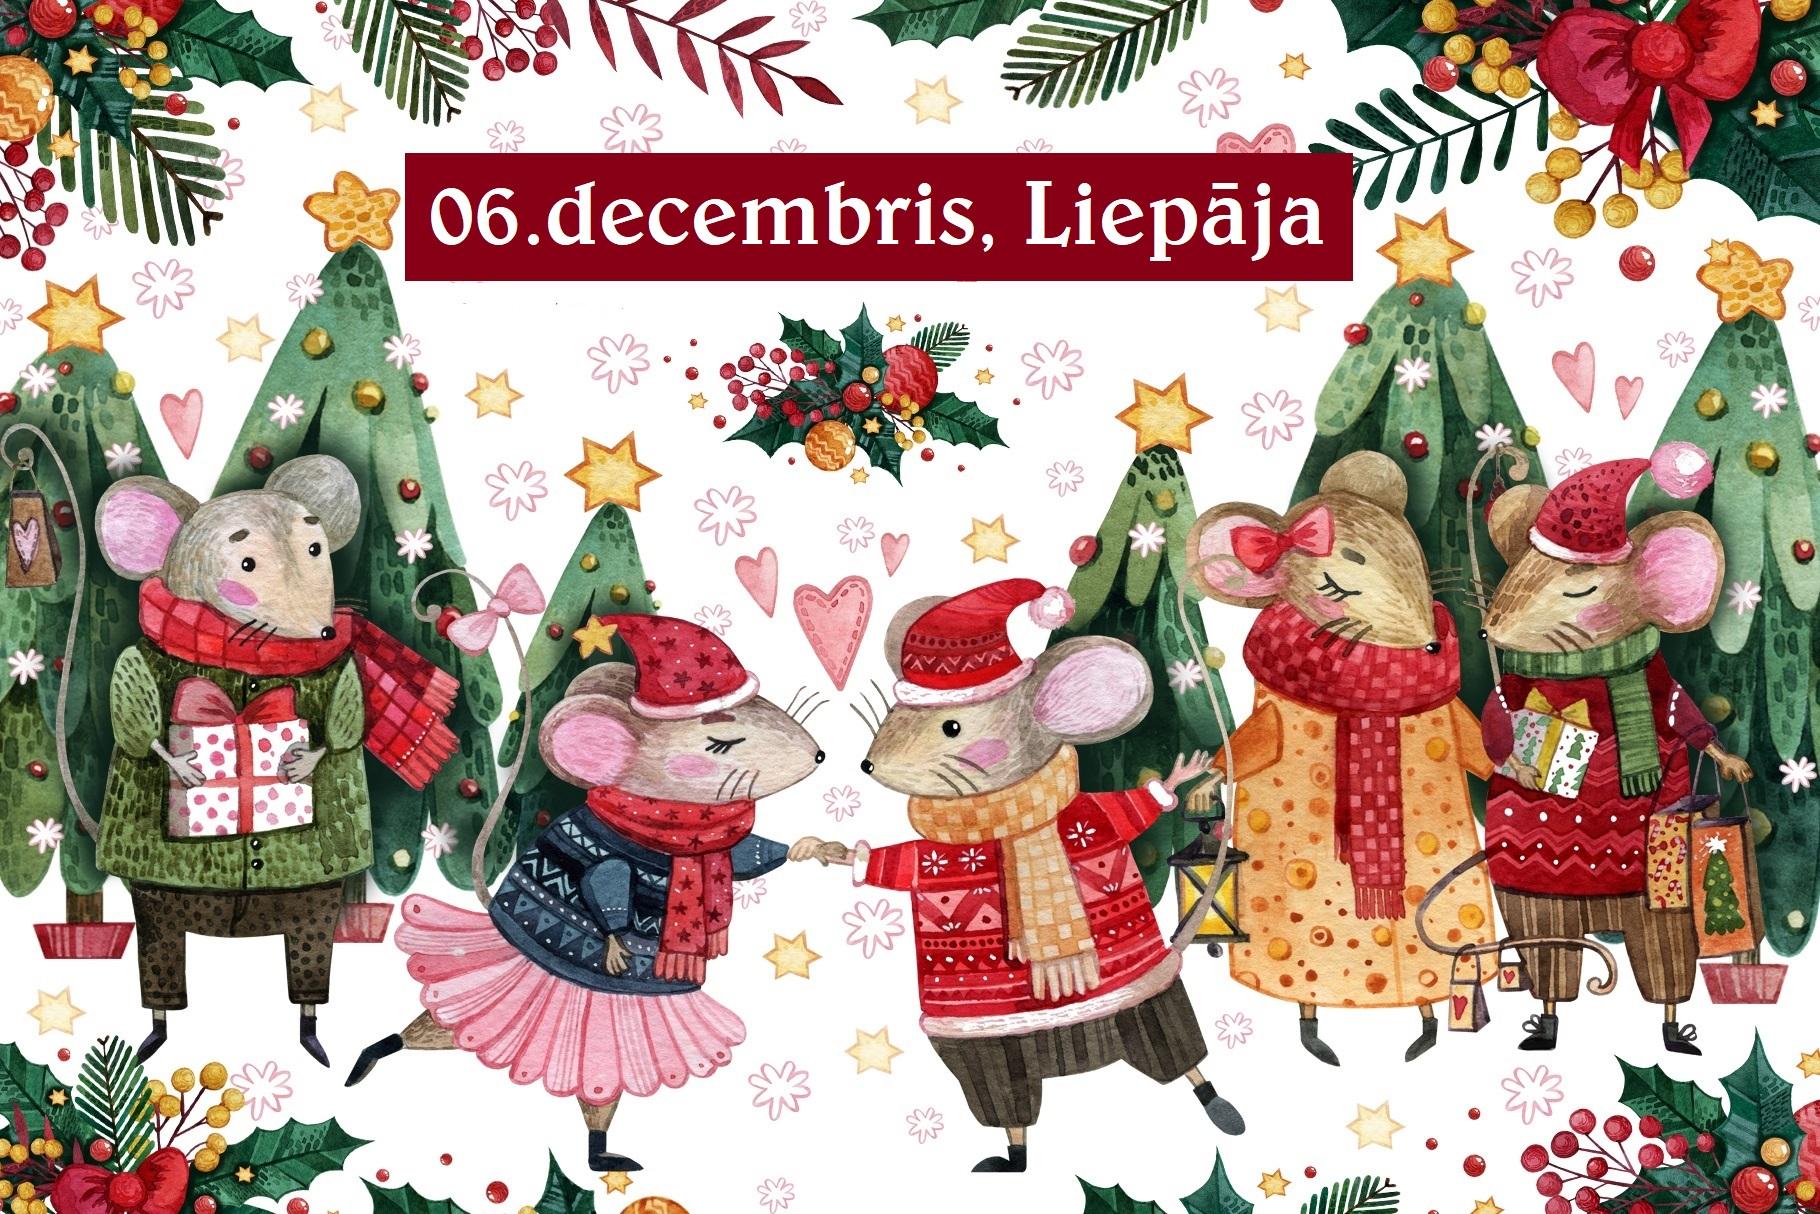 GREAT WINTER fair in Liepaja